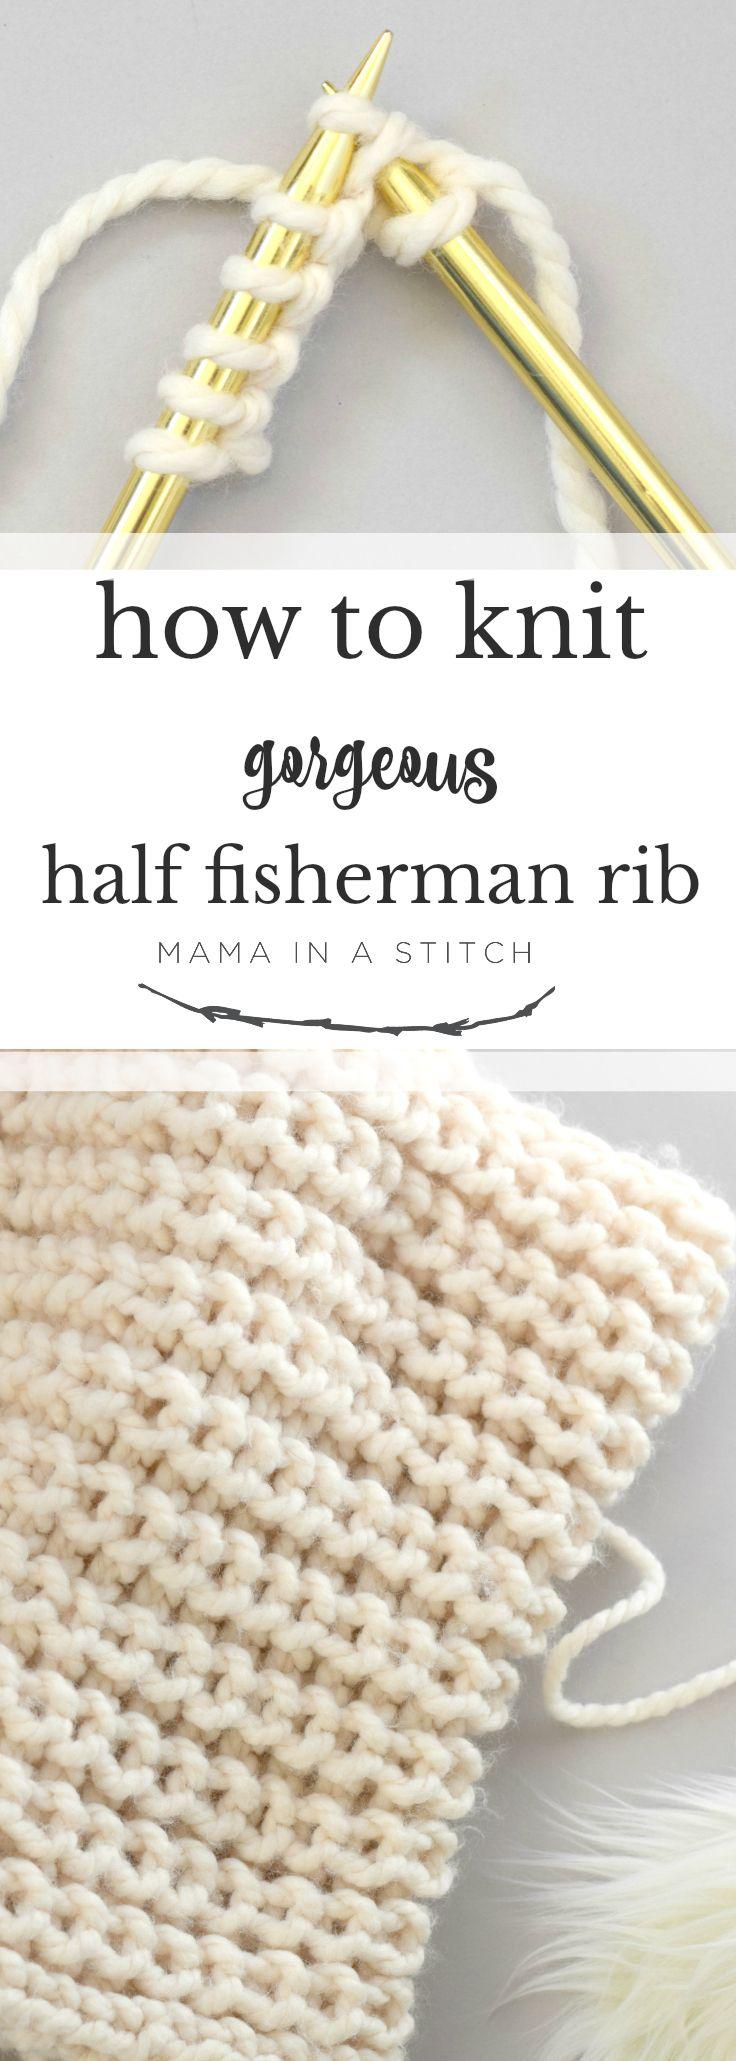 Pin de Cindy Price en Knit & Crochet ~ TUTORIALS | Pinterest ...